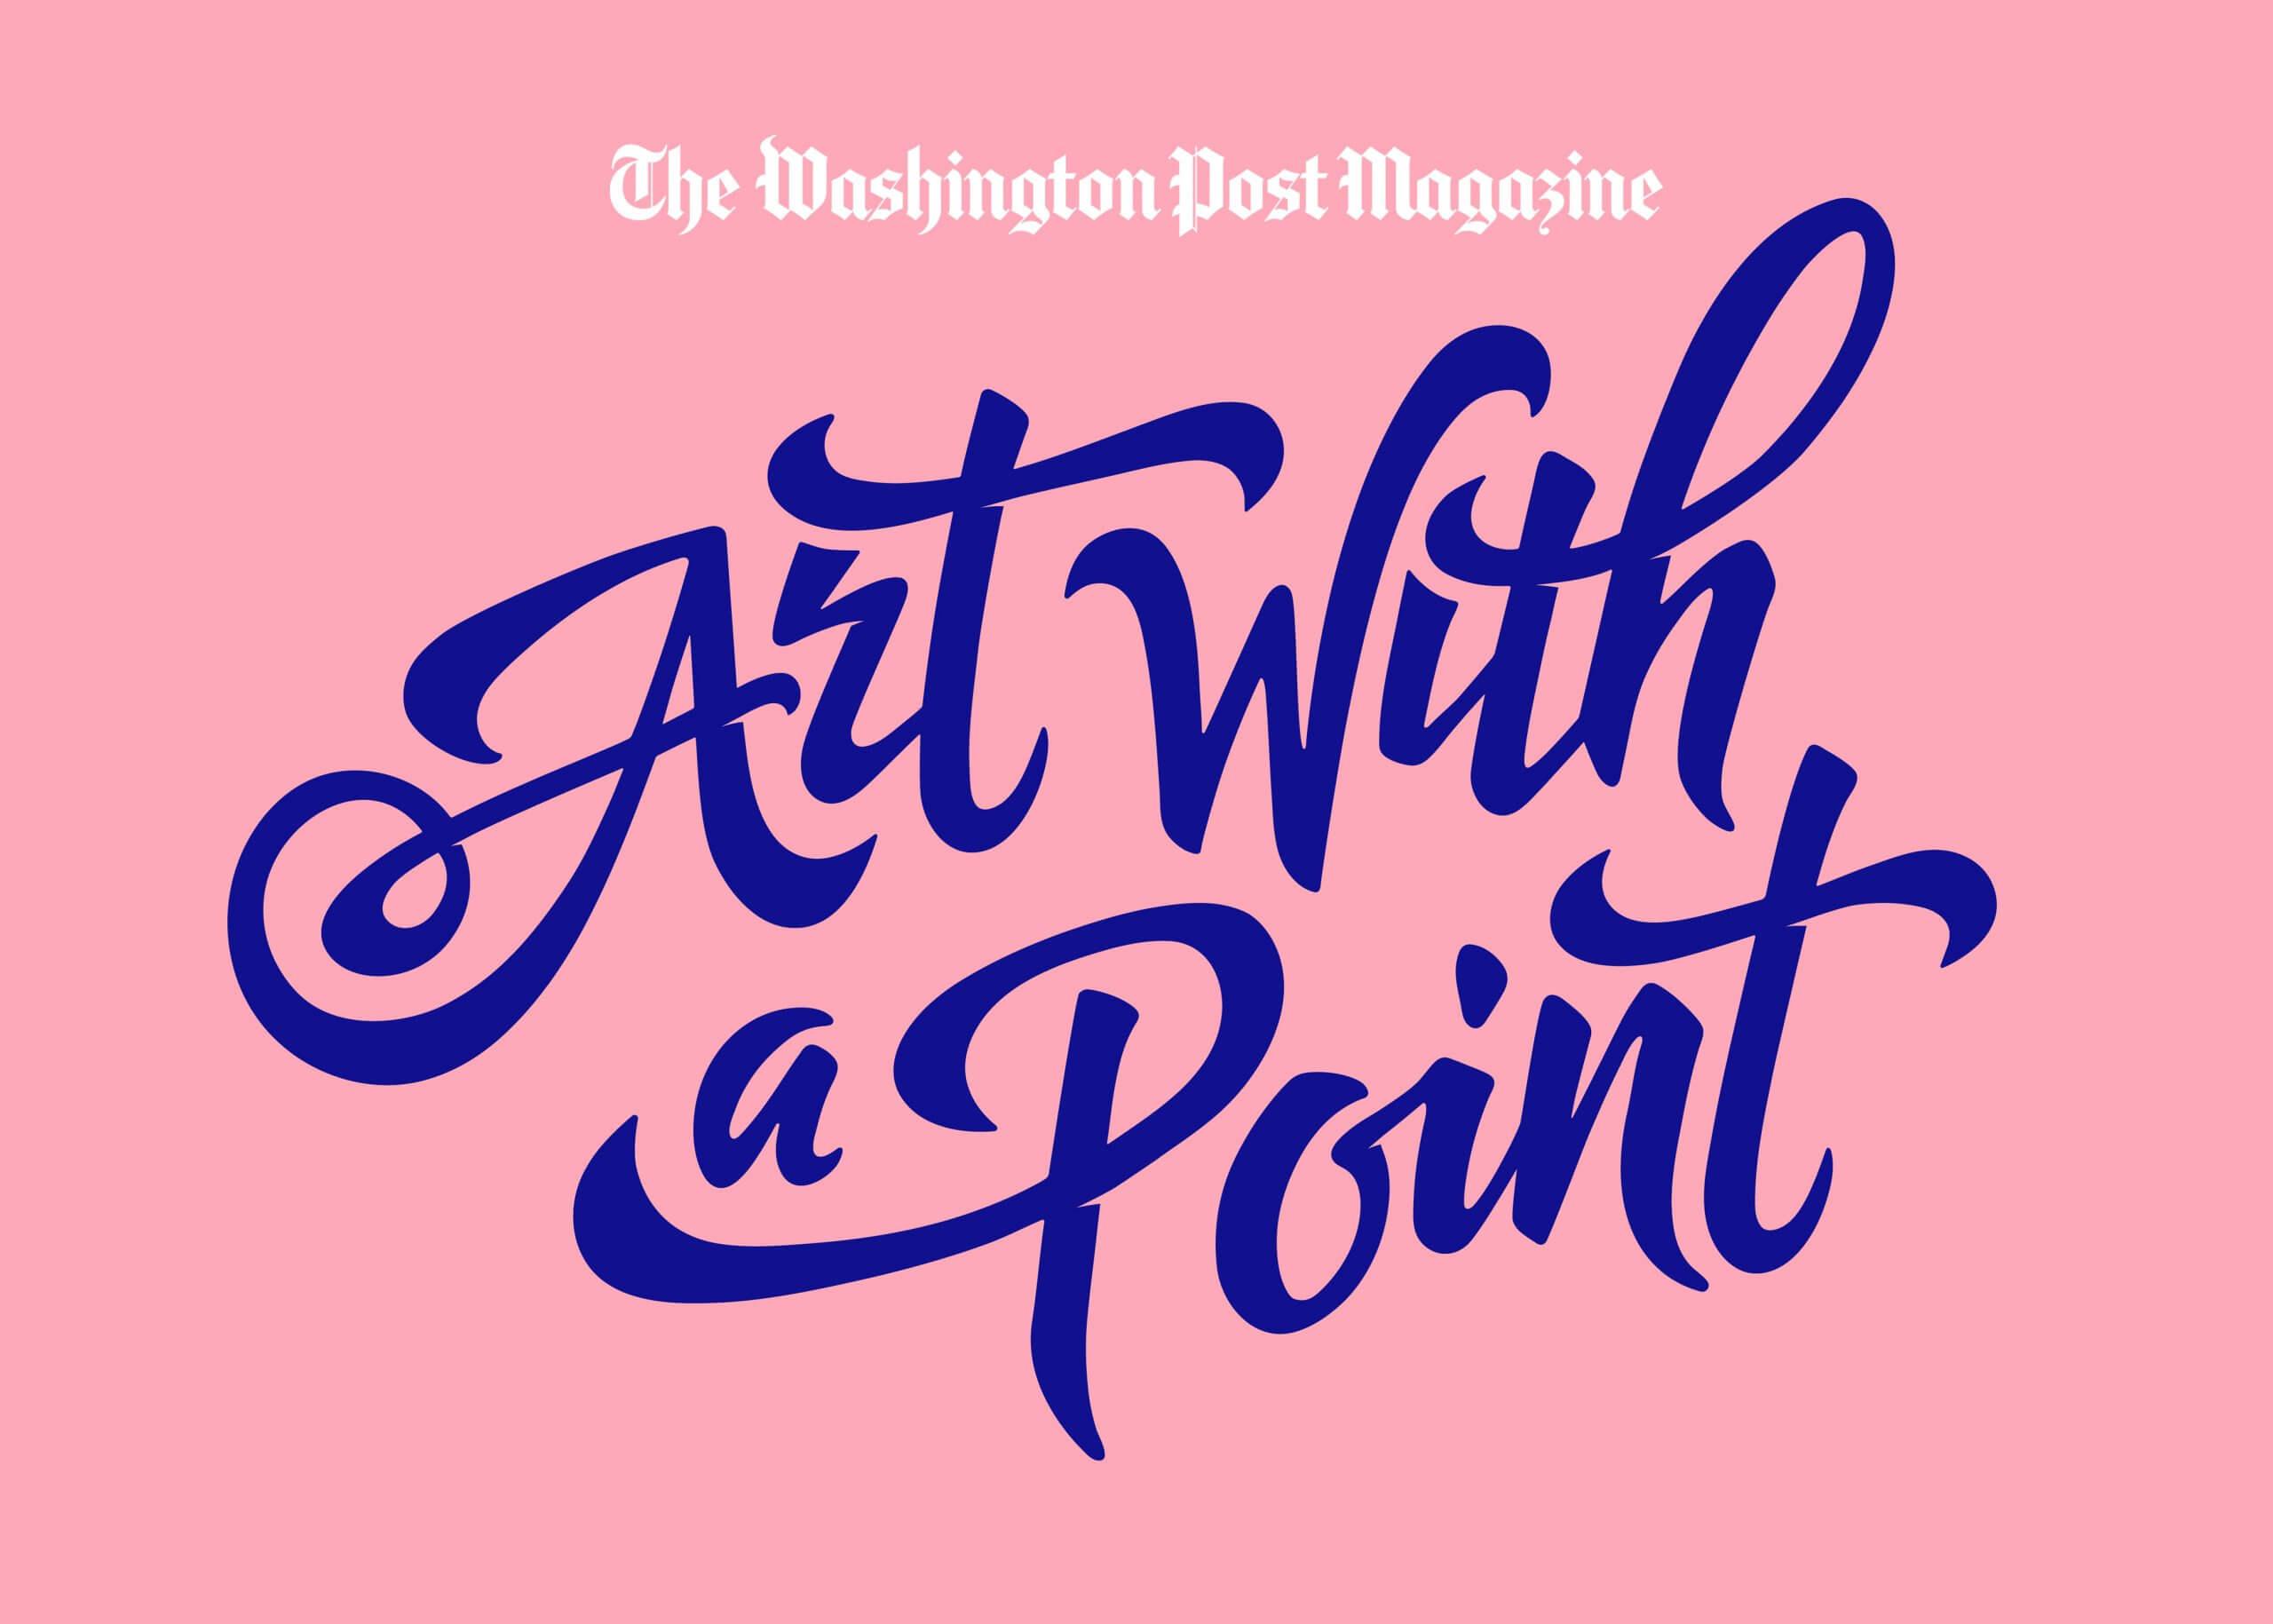 Craig Black x The Washington Post Magazine - Art With a Point